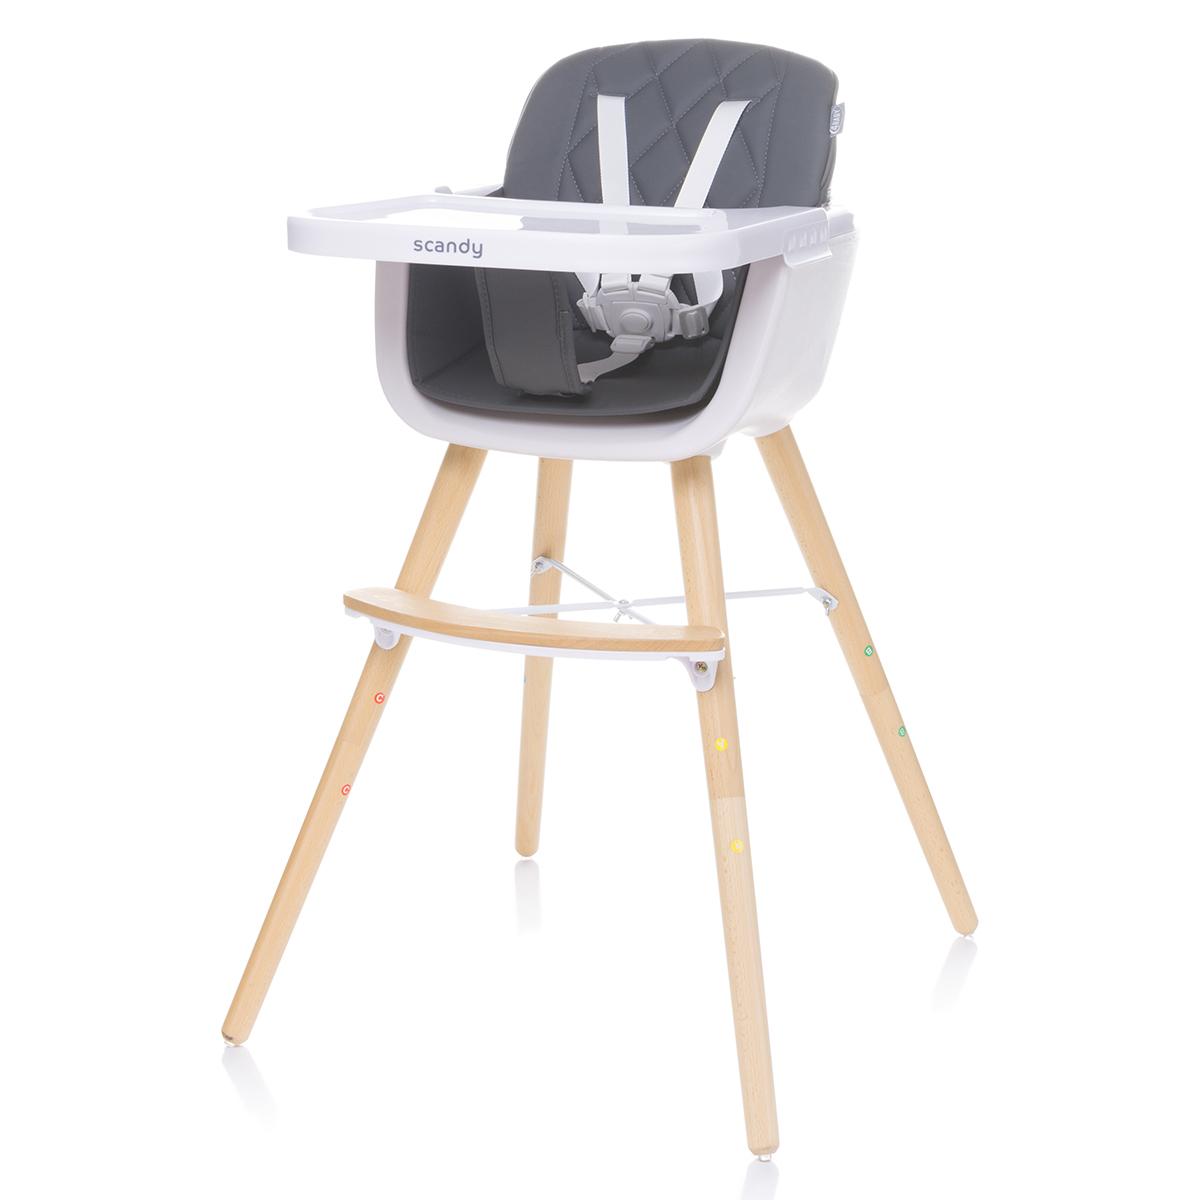 Chaise haute Chaise Haute Scandy - Dark Grey Chaise Haute Scandy - Dark Grey